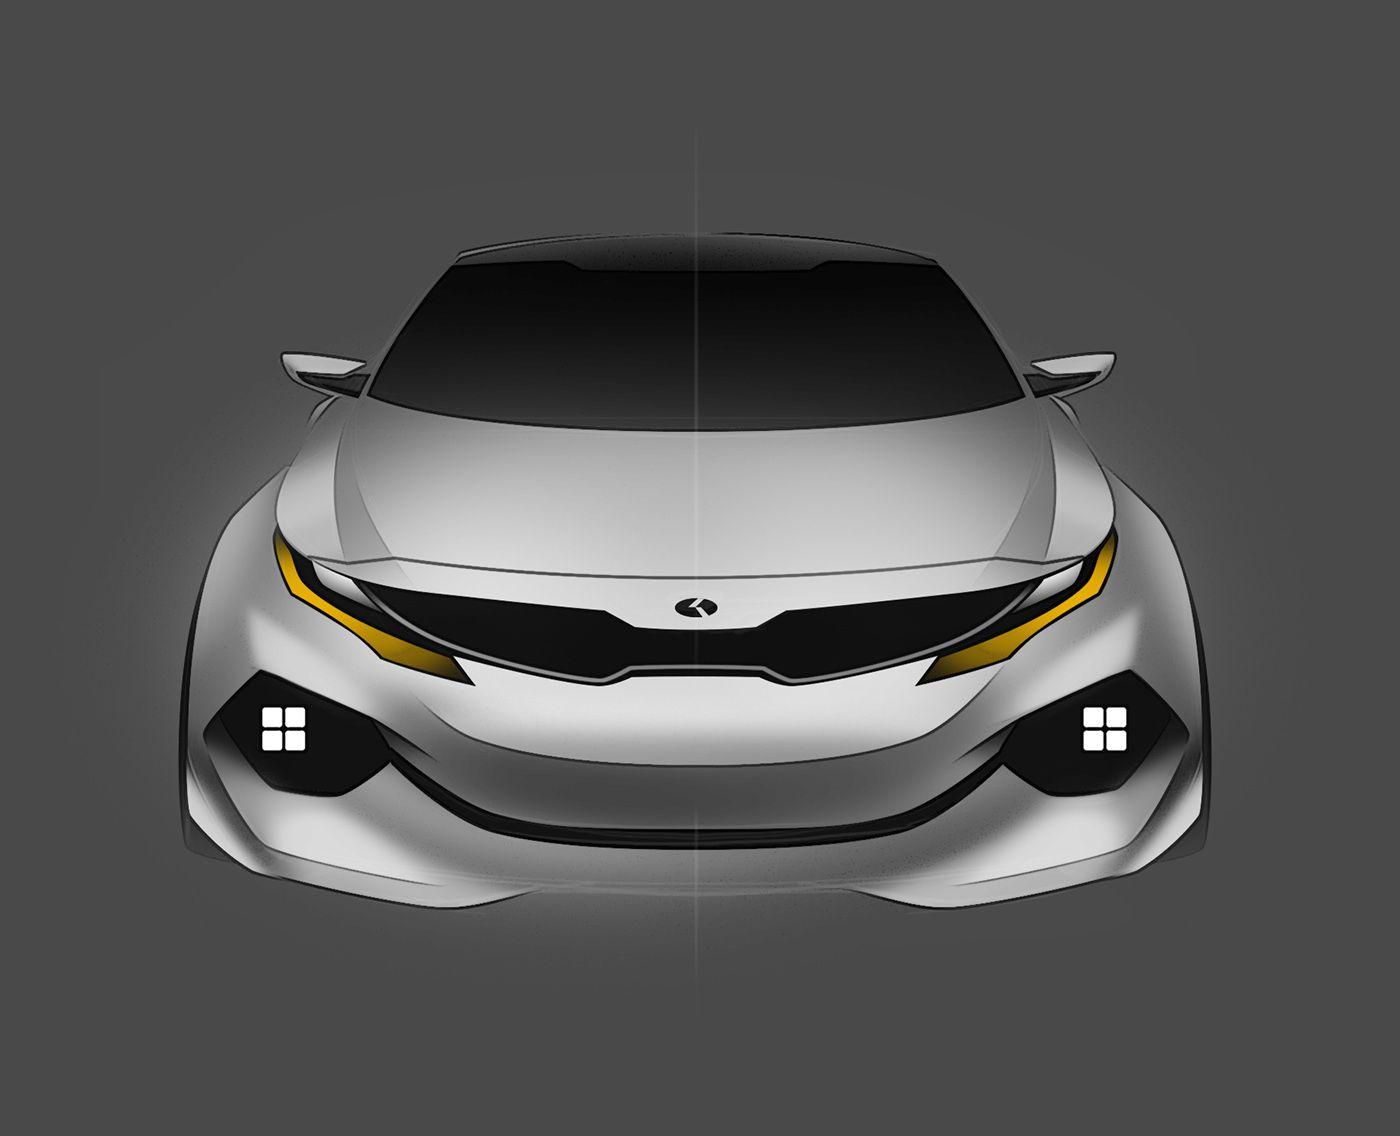 Kia K3 3 Concept on Behance  Automotive illustration, Kia